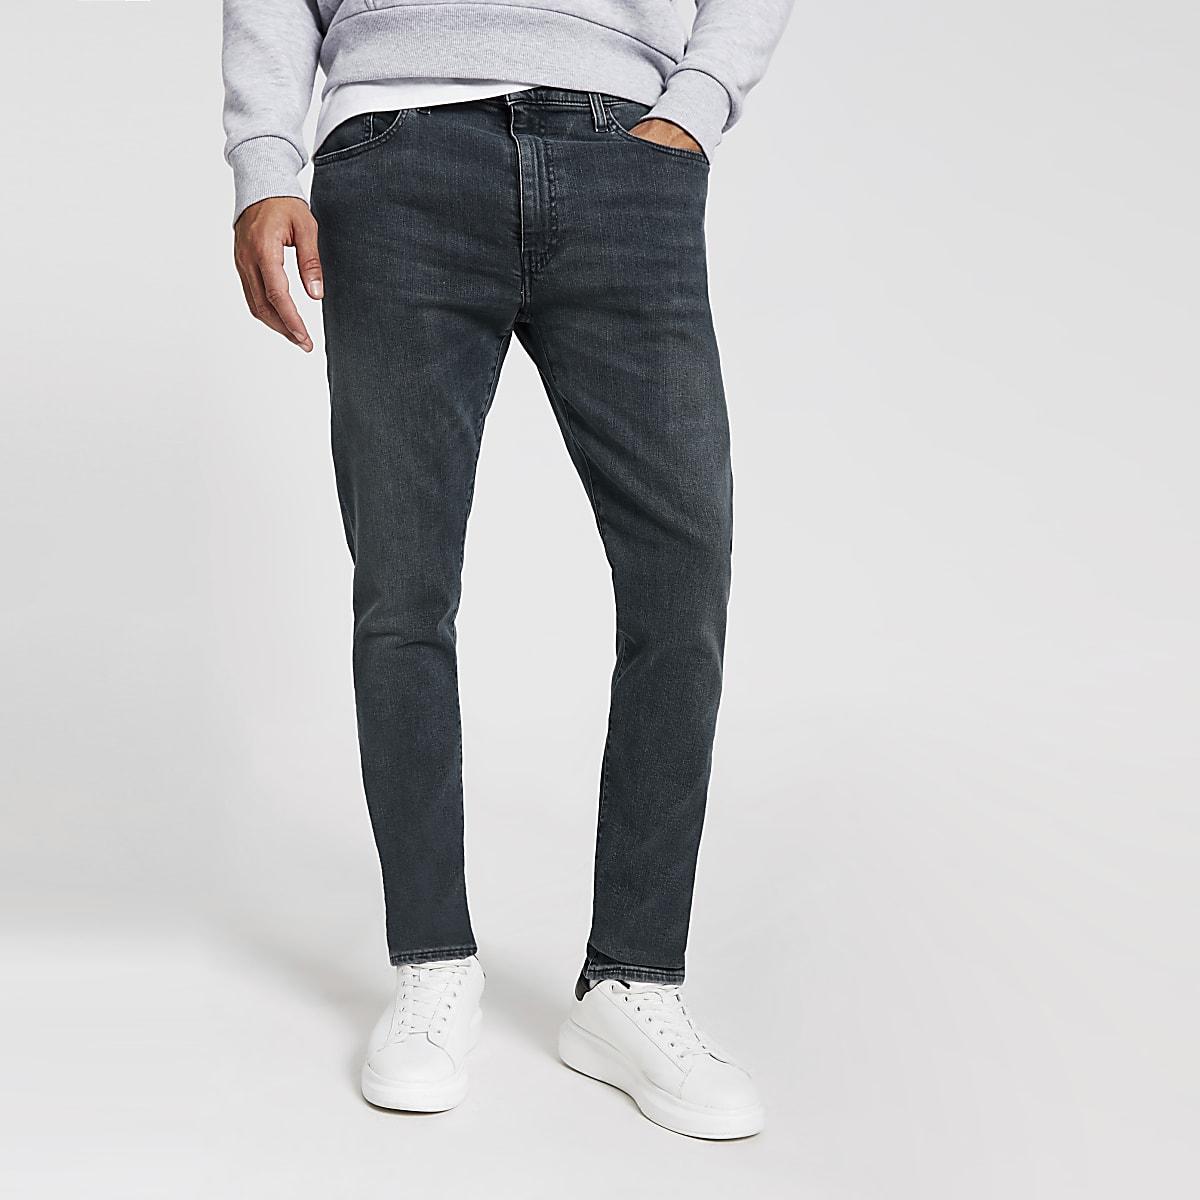 Levi's - Lichtblauwe 512 slim-fit denim jeans